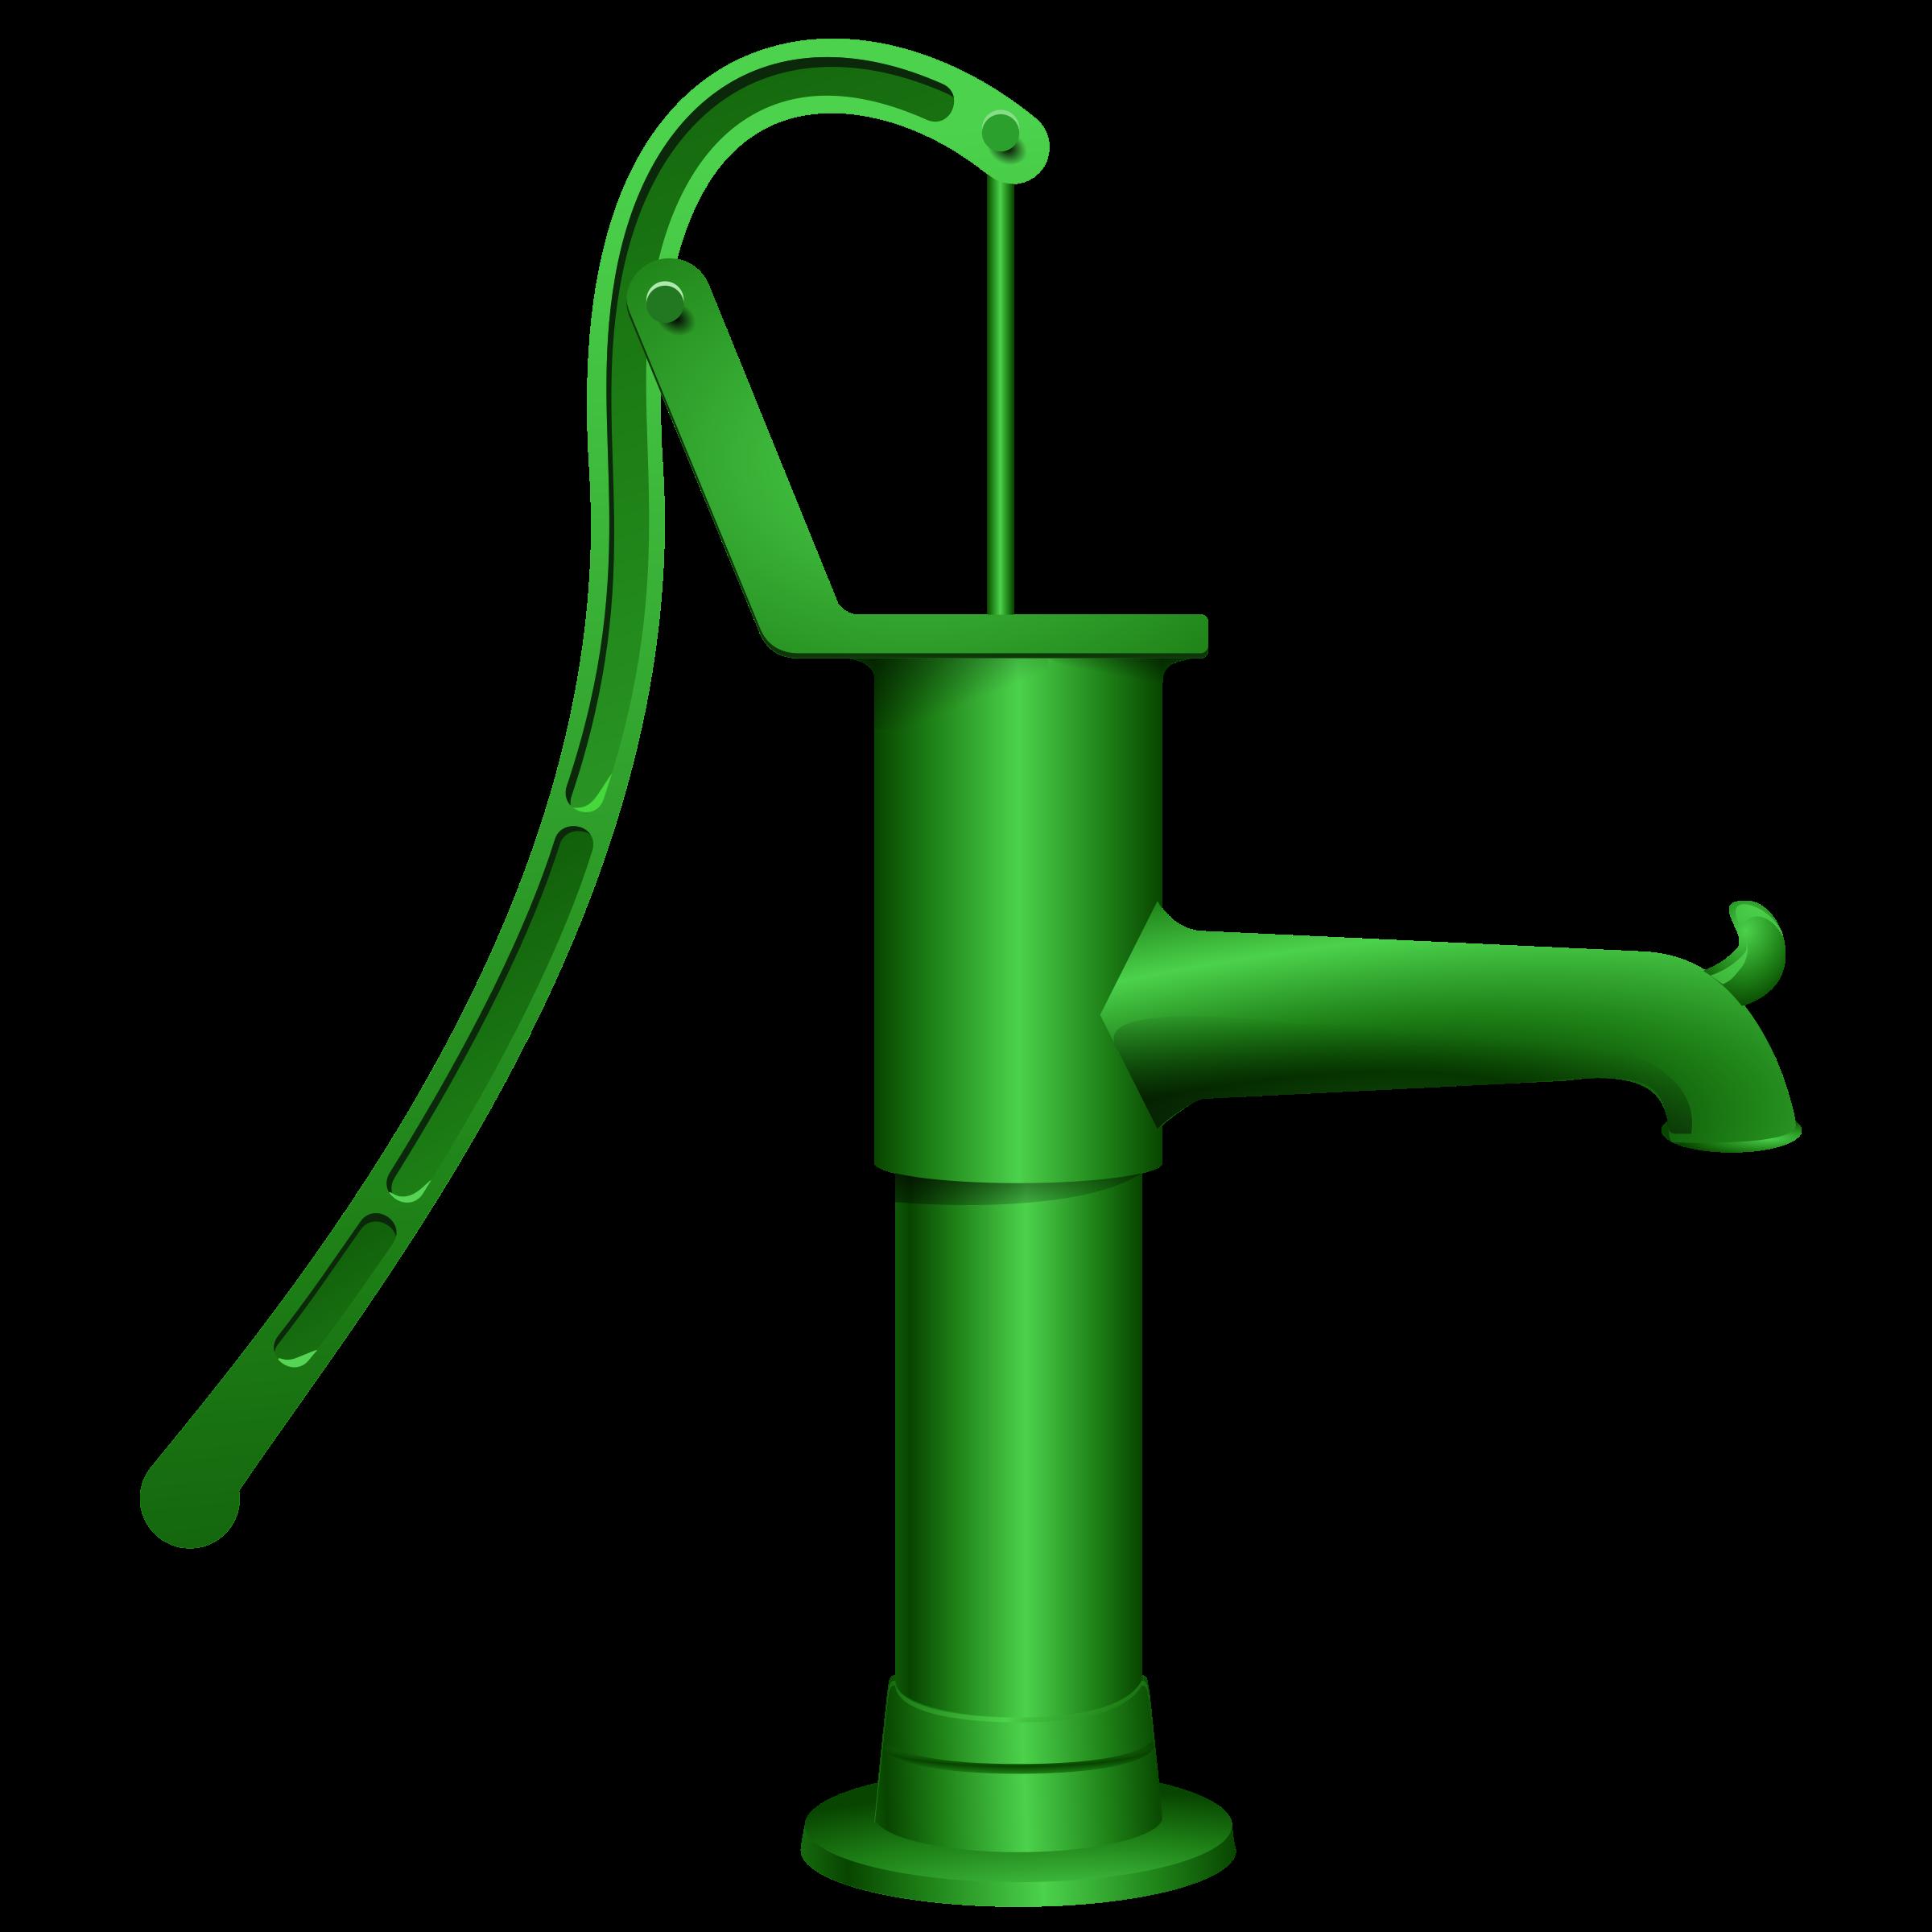 Hand pump clipart.